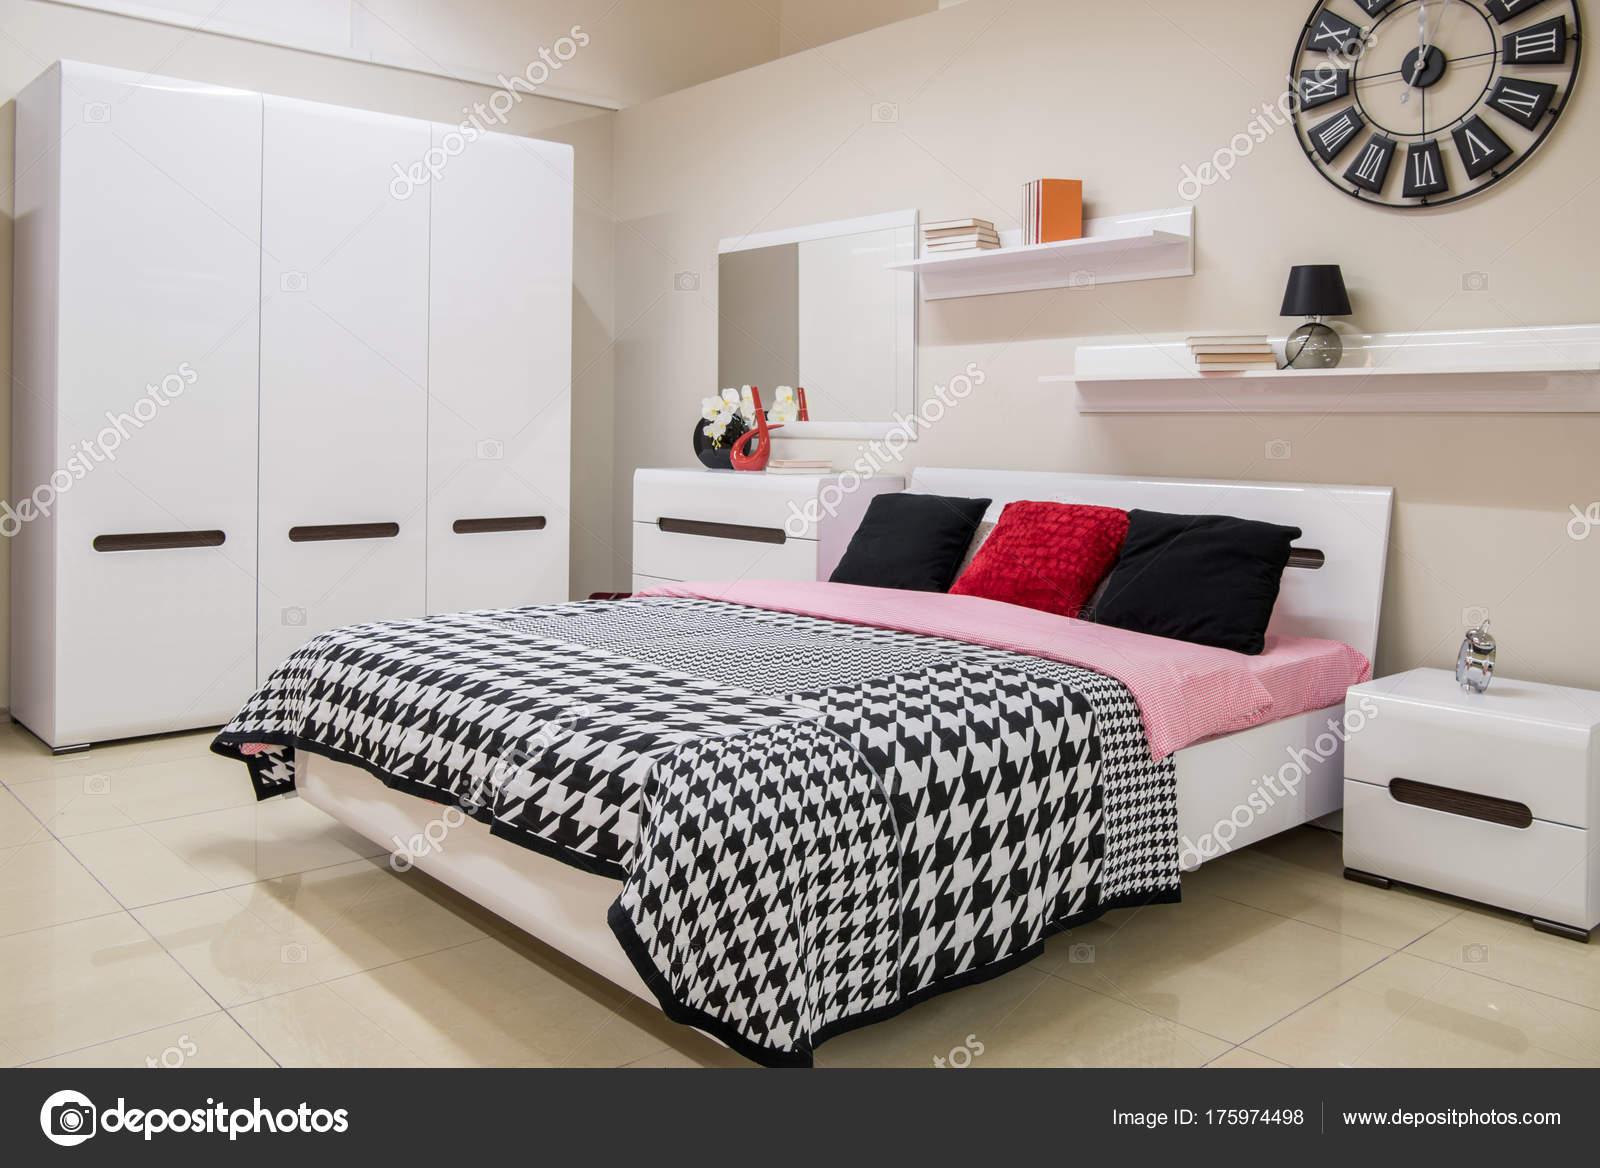 Gezellige Moderne Slaapkamer Interieur Met Bed — Stockfoto ...